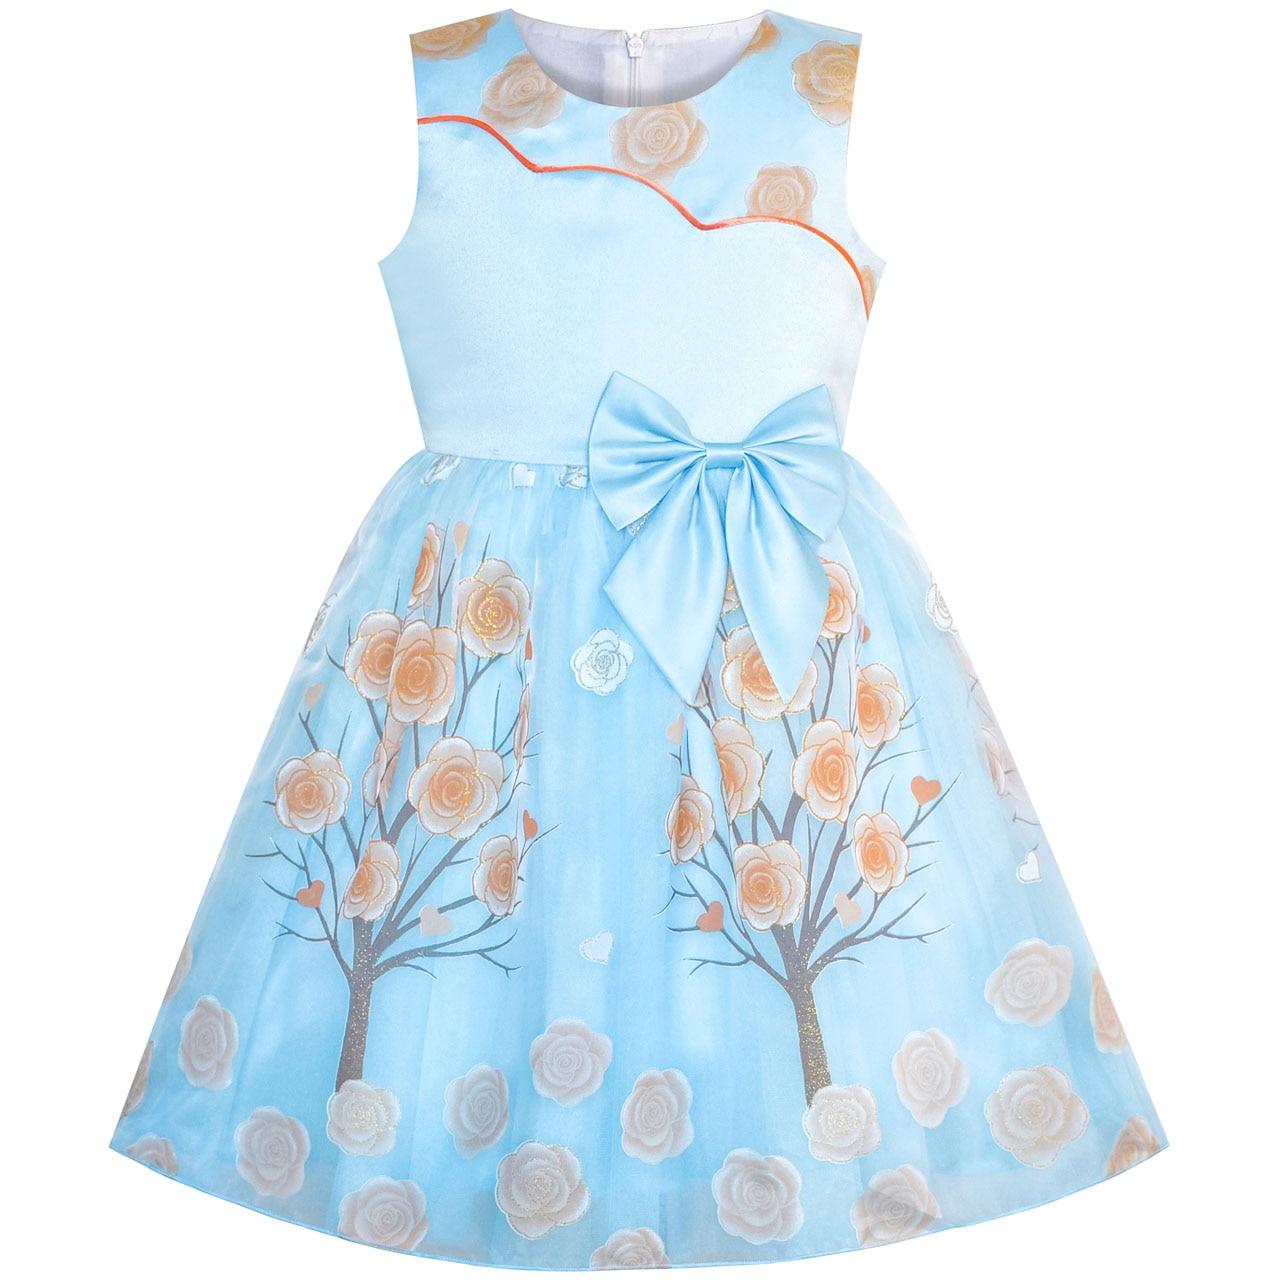 Girls Dress Plum Flower Tree Bow Tie Party Pageant 2019 Summer Princess Wedding Dresses Children Clothes Sundress Vestidos